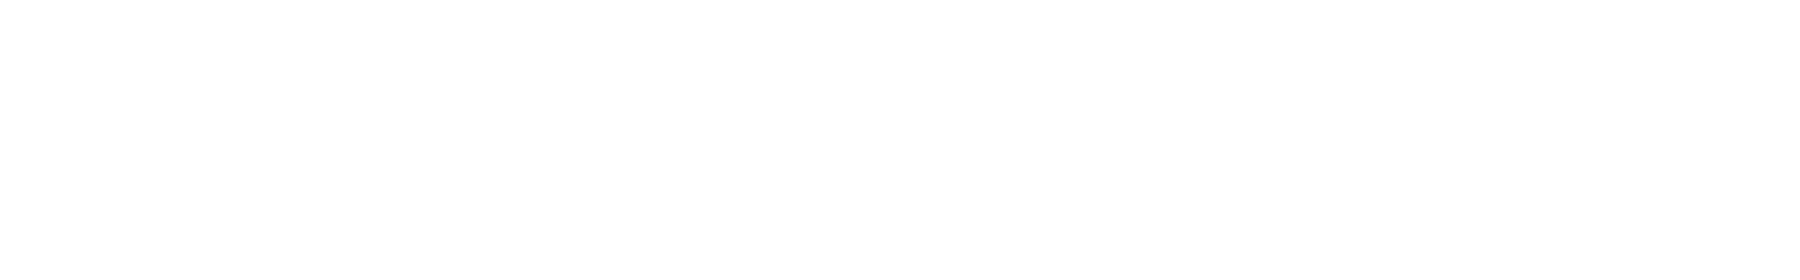 pad16